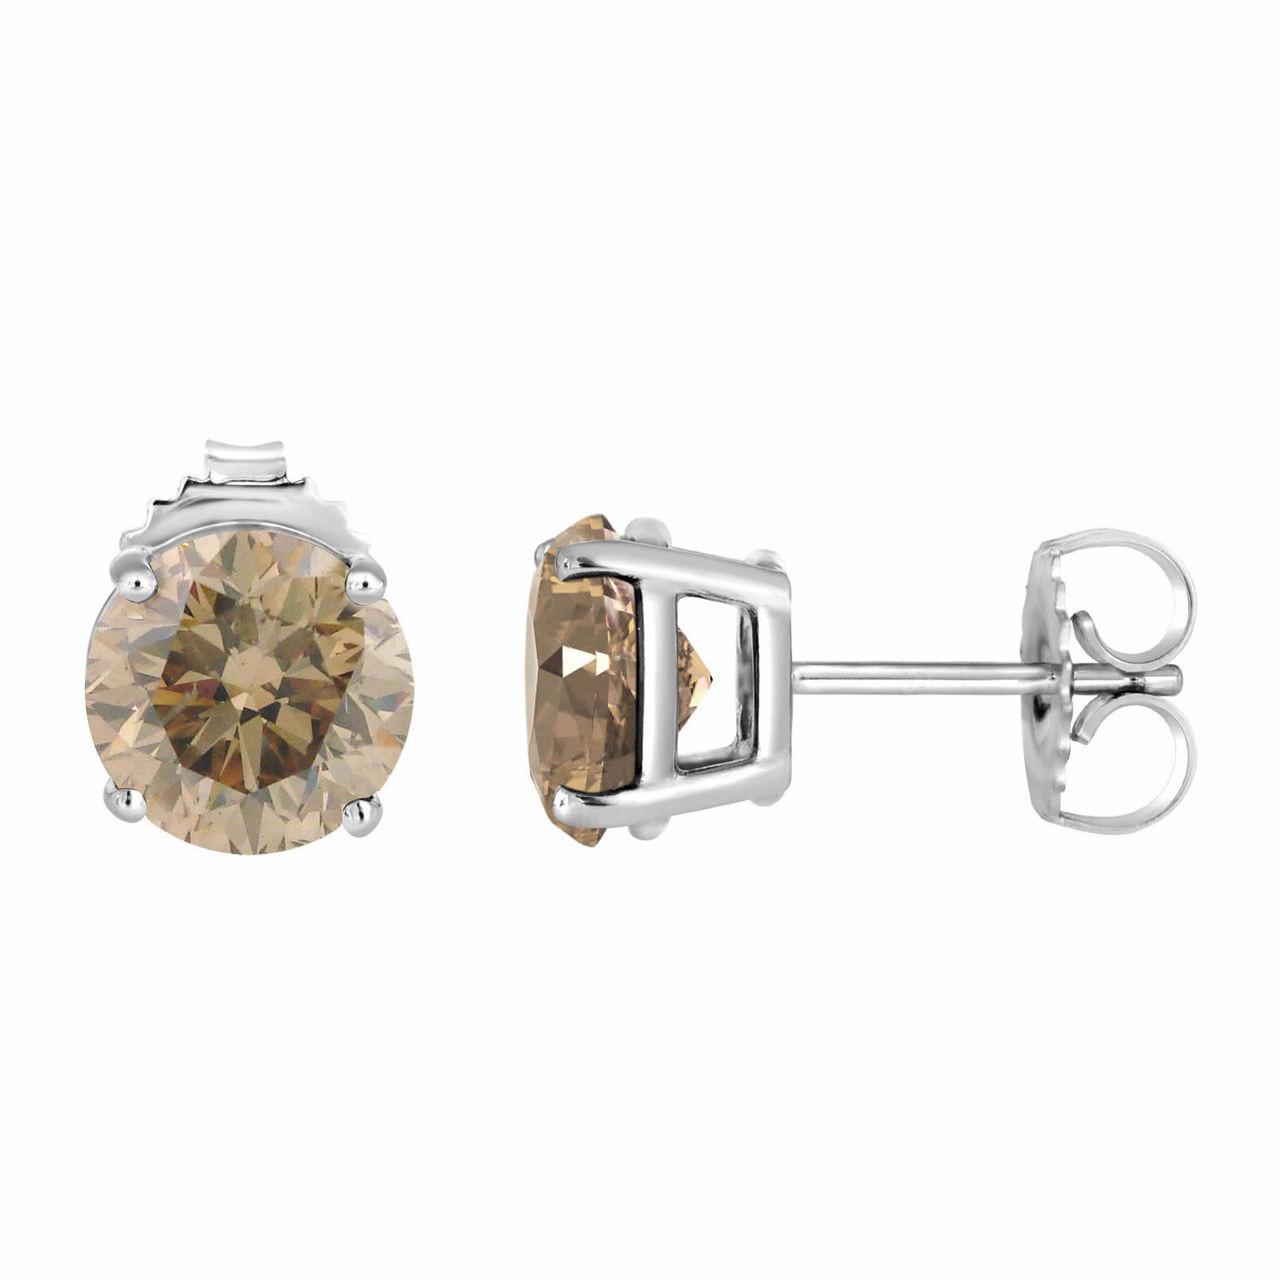 Platinum Champagne Diamond Stud Earrings 2 02 Carat